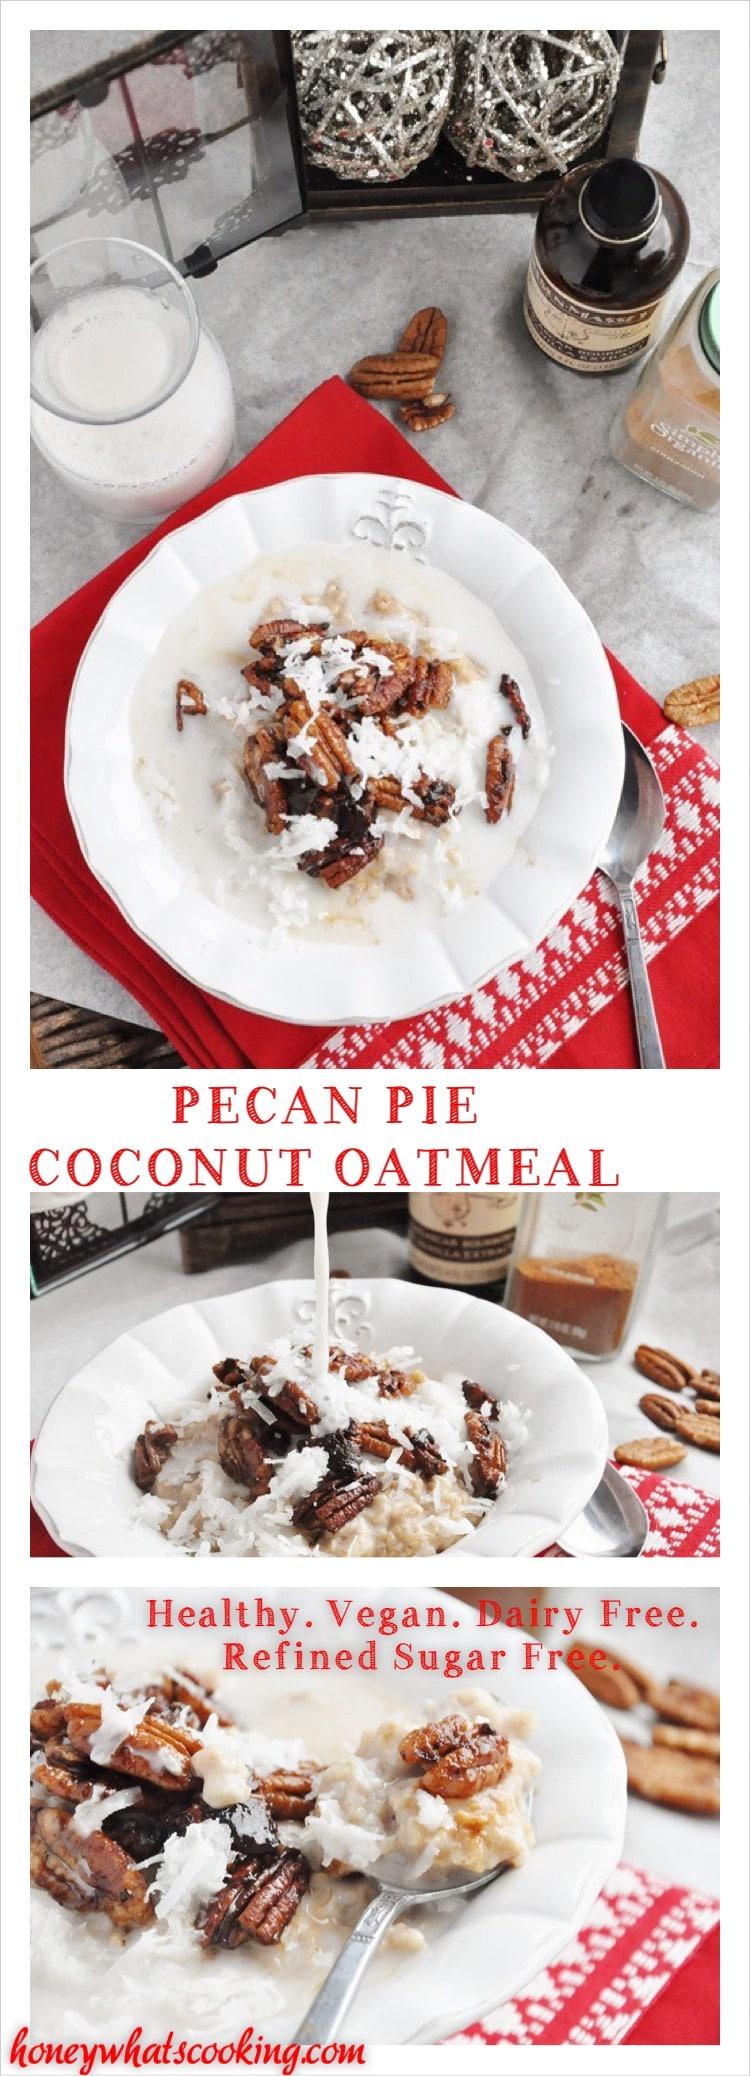 Pecan Pie Coconut Oatmeal - healthy, vegan, dairy free, refined sugar free.